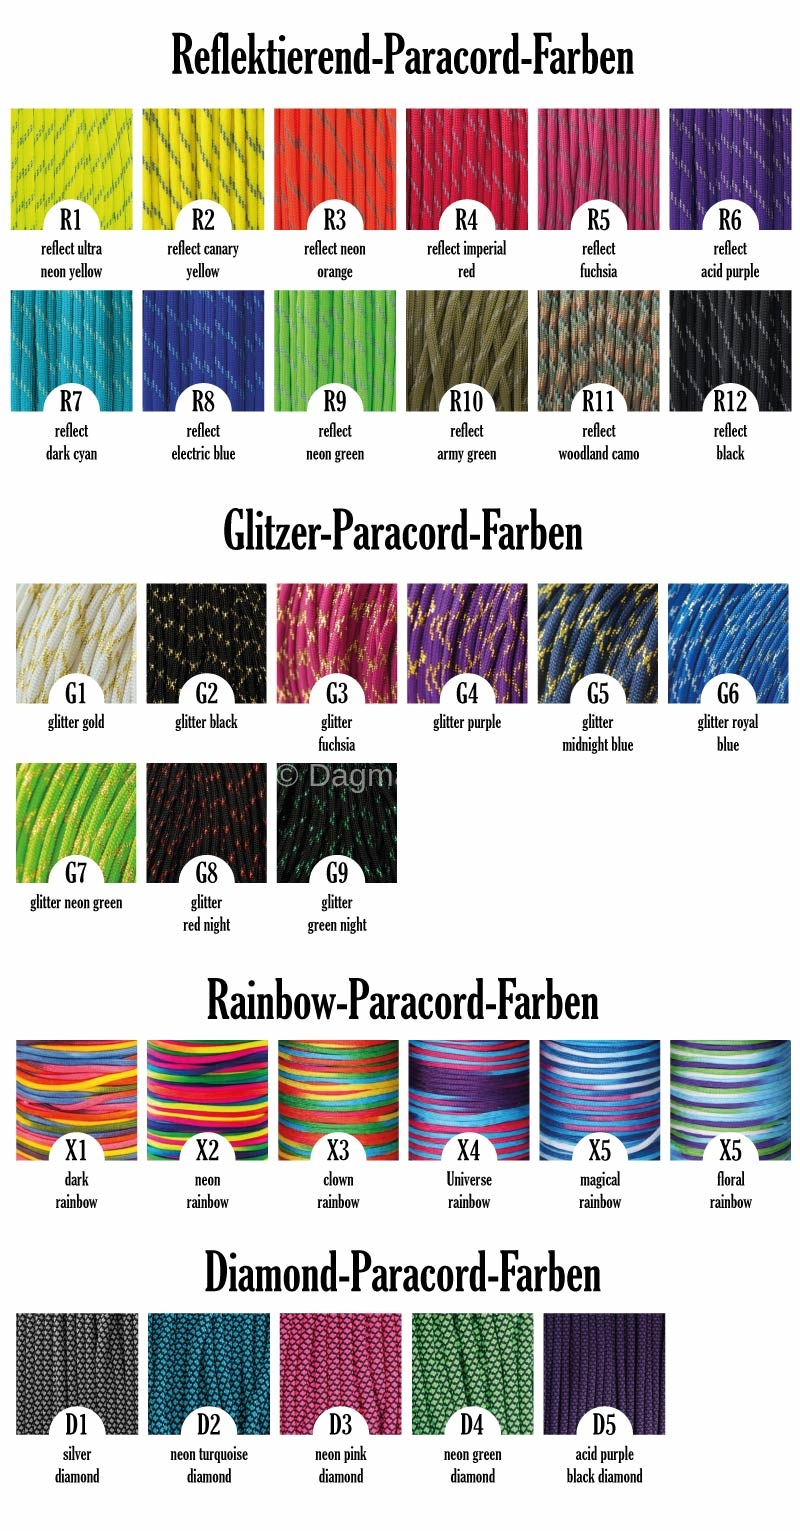 farbpaletten paracord eu reflect